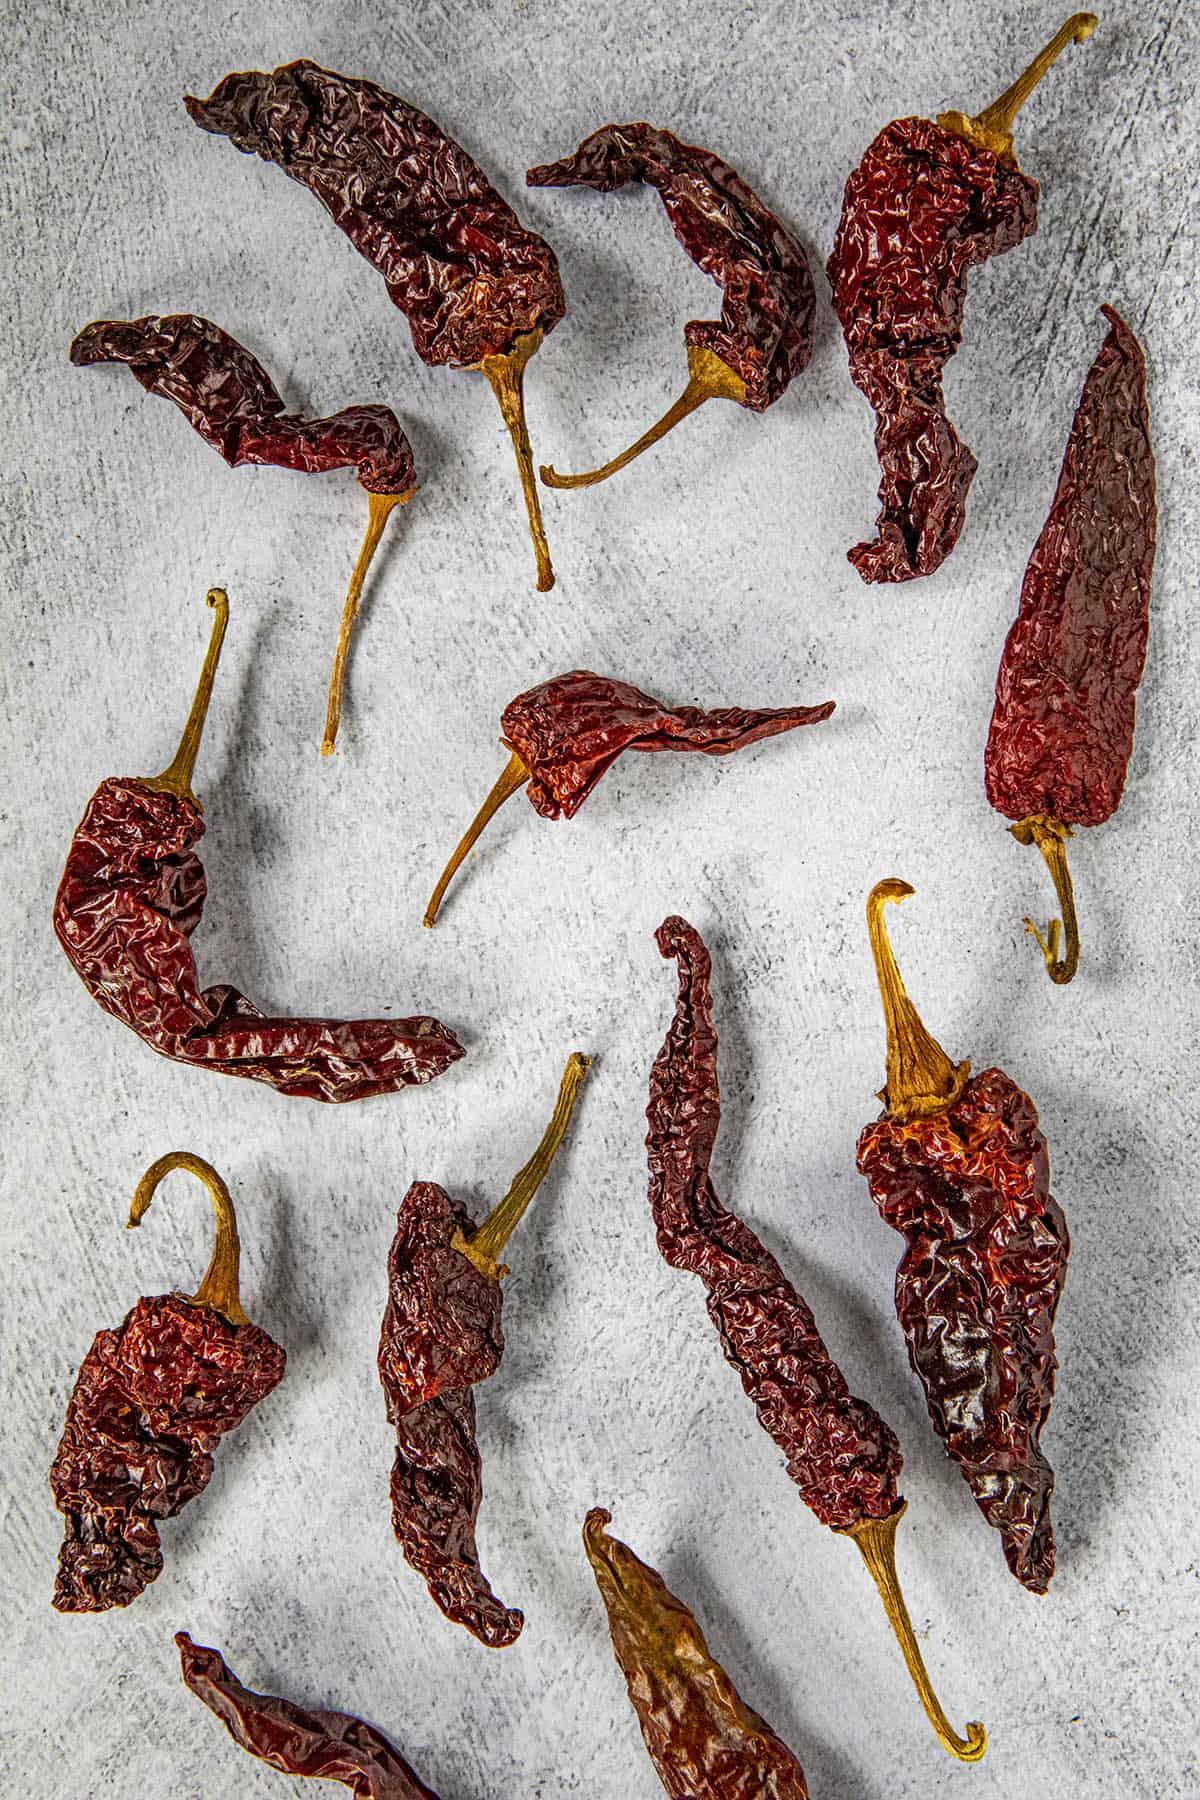 Kashmiri Chili: Vibrant Red Peppers